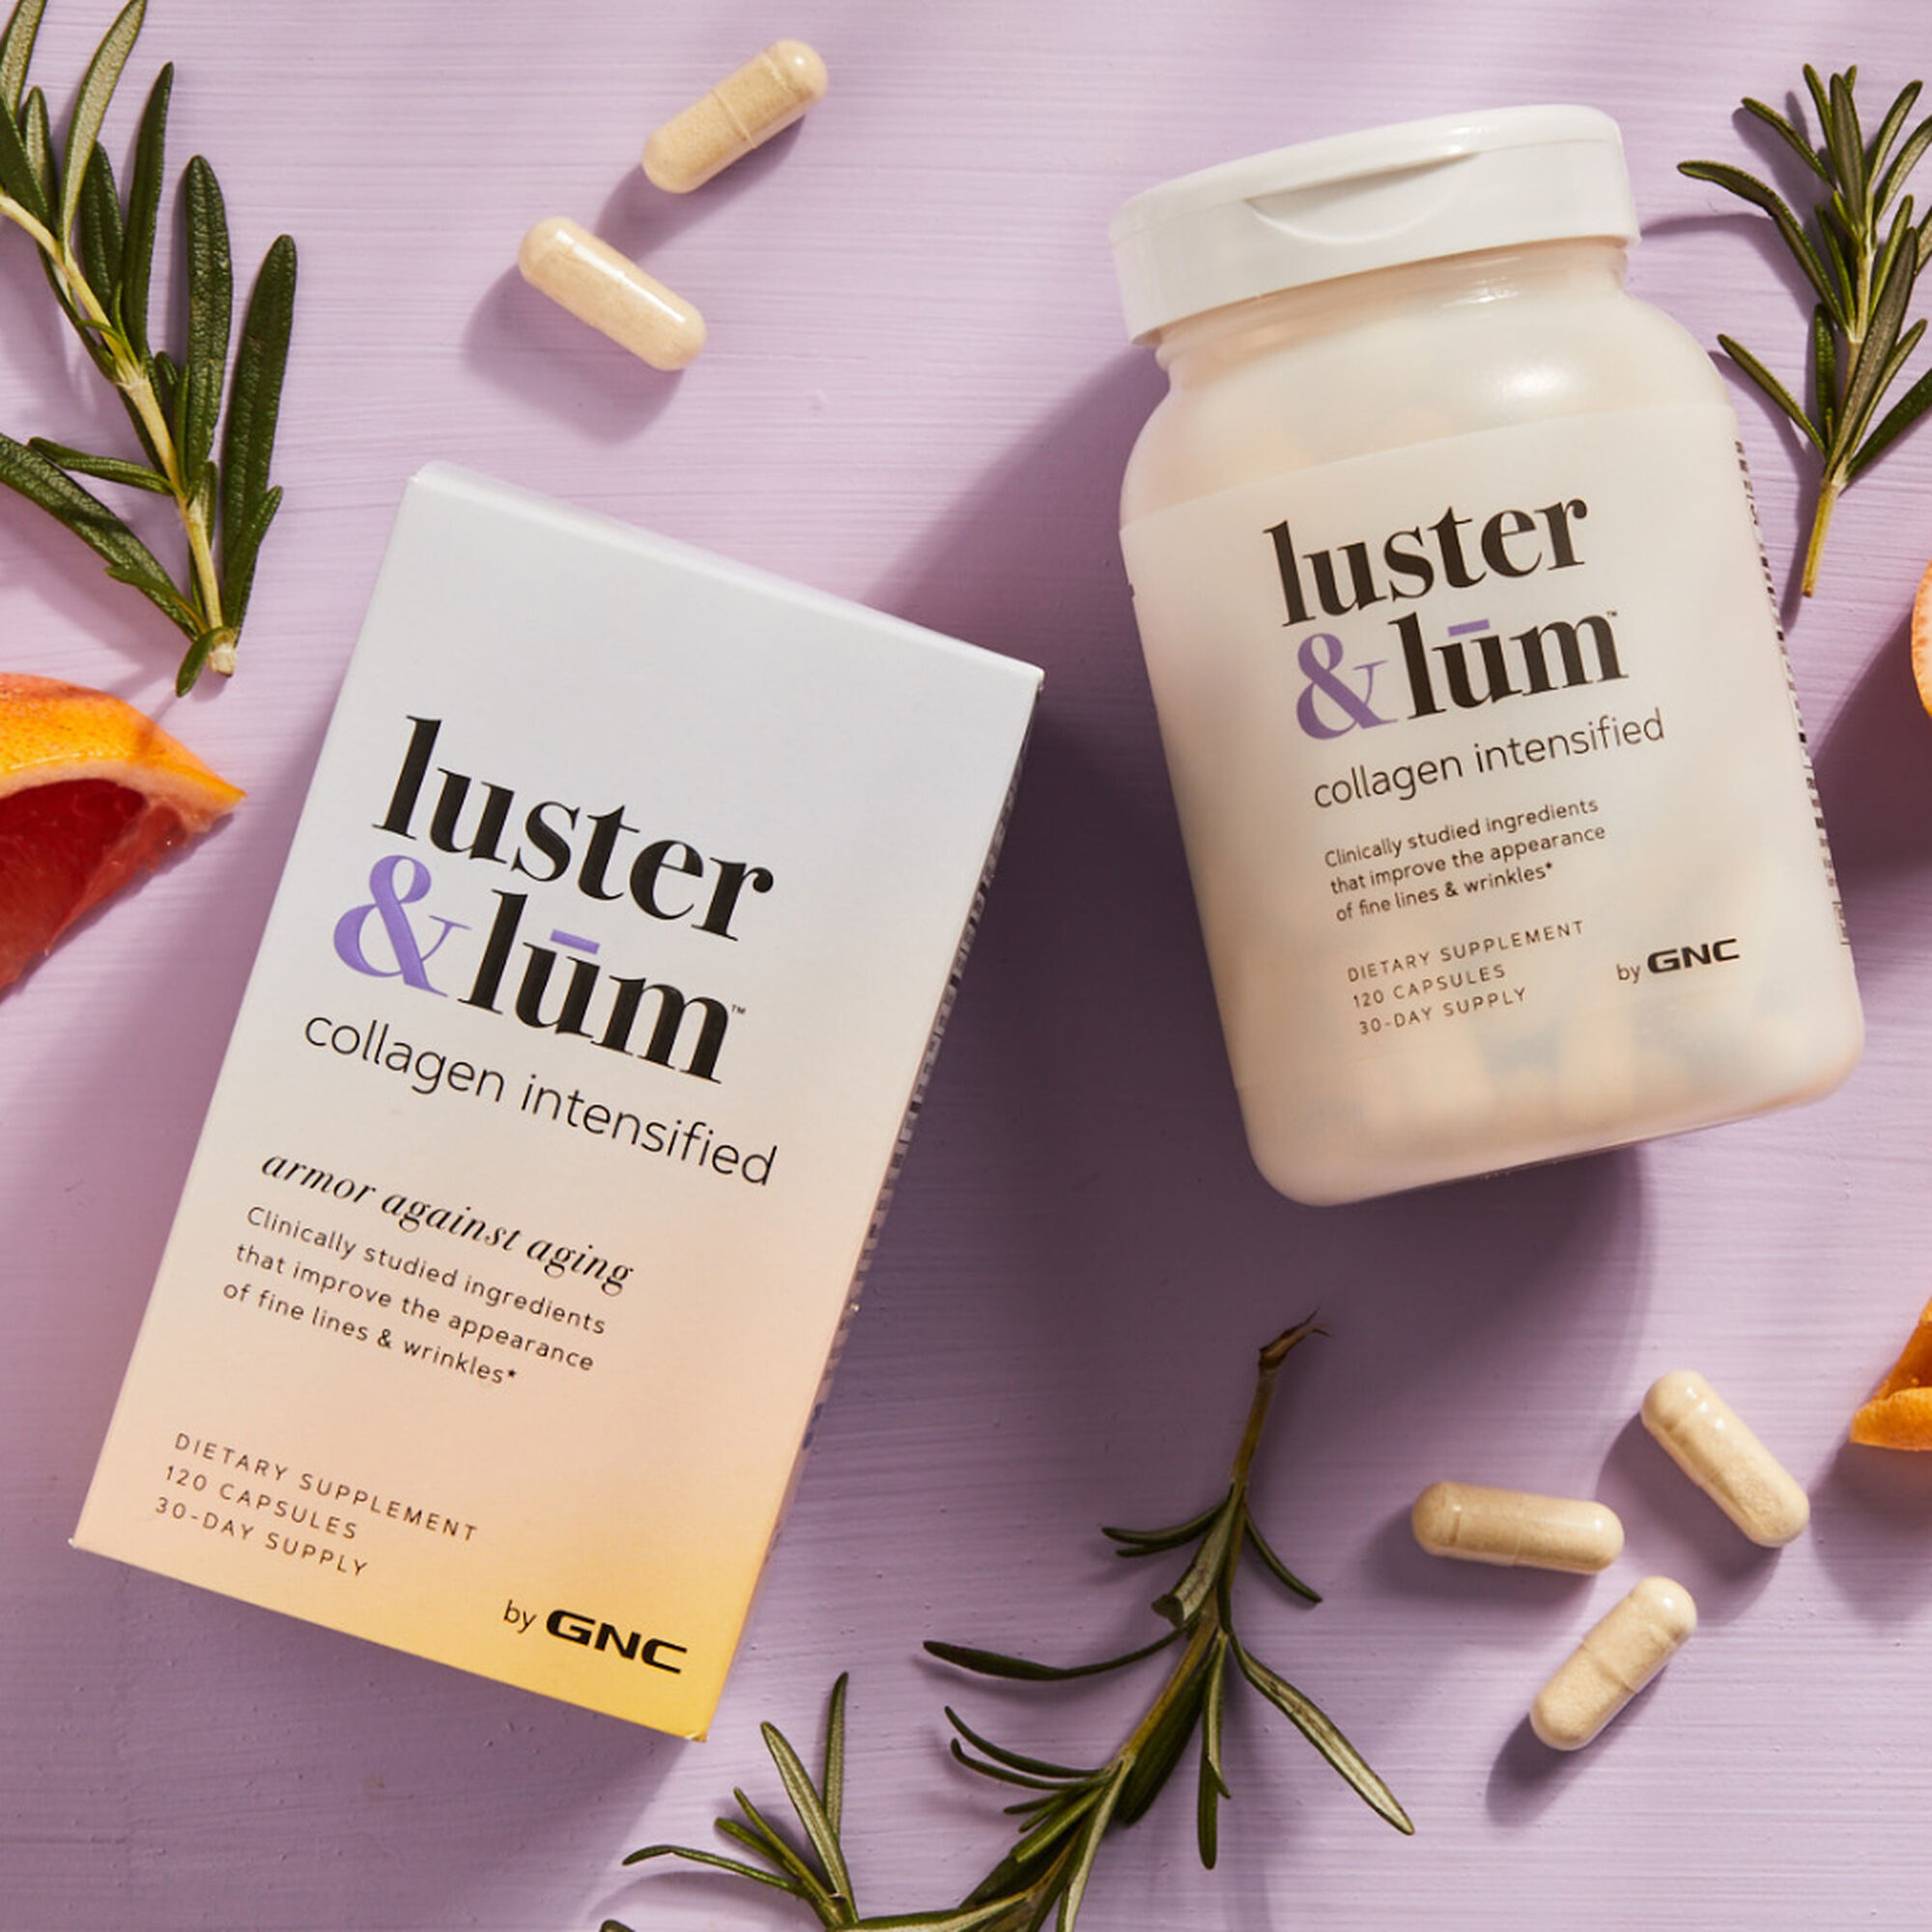 GNC luster & lum® Collagen Intensified